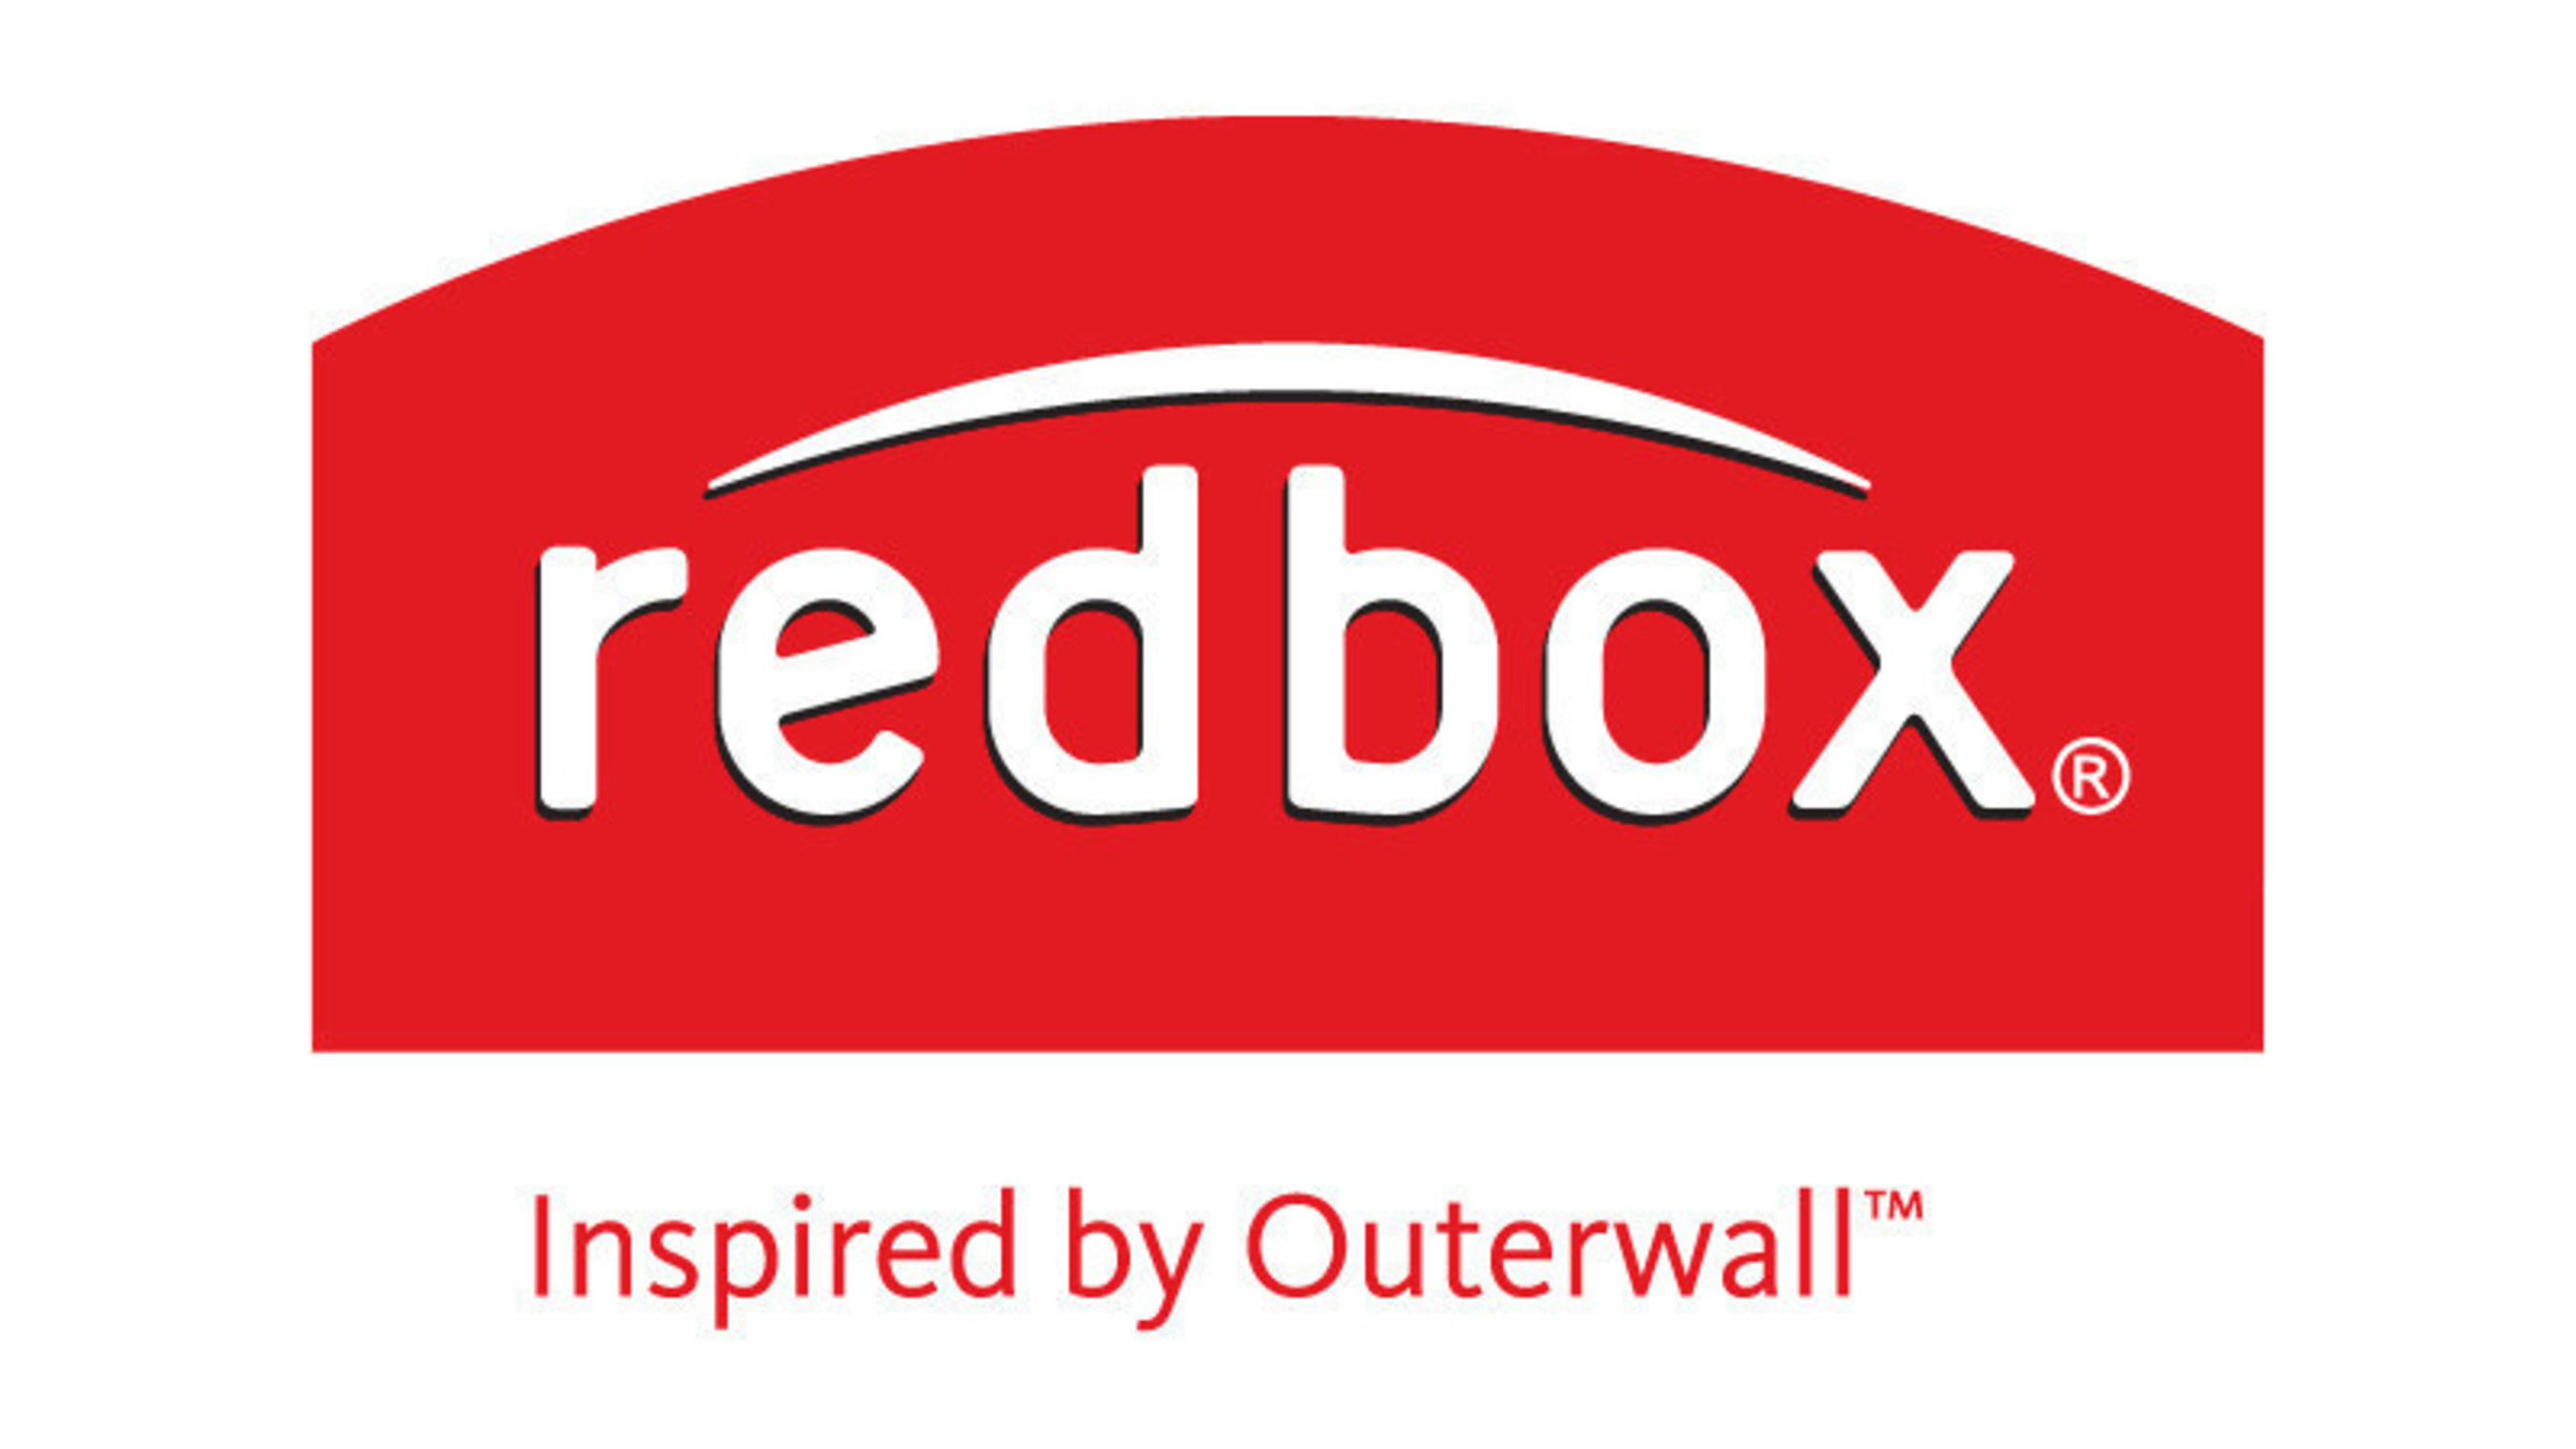 Redbox (PRNewsFoto/Outerwall Inc.)